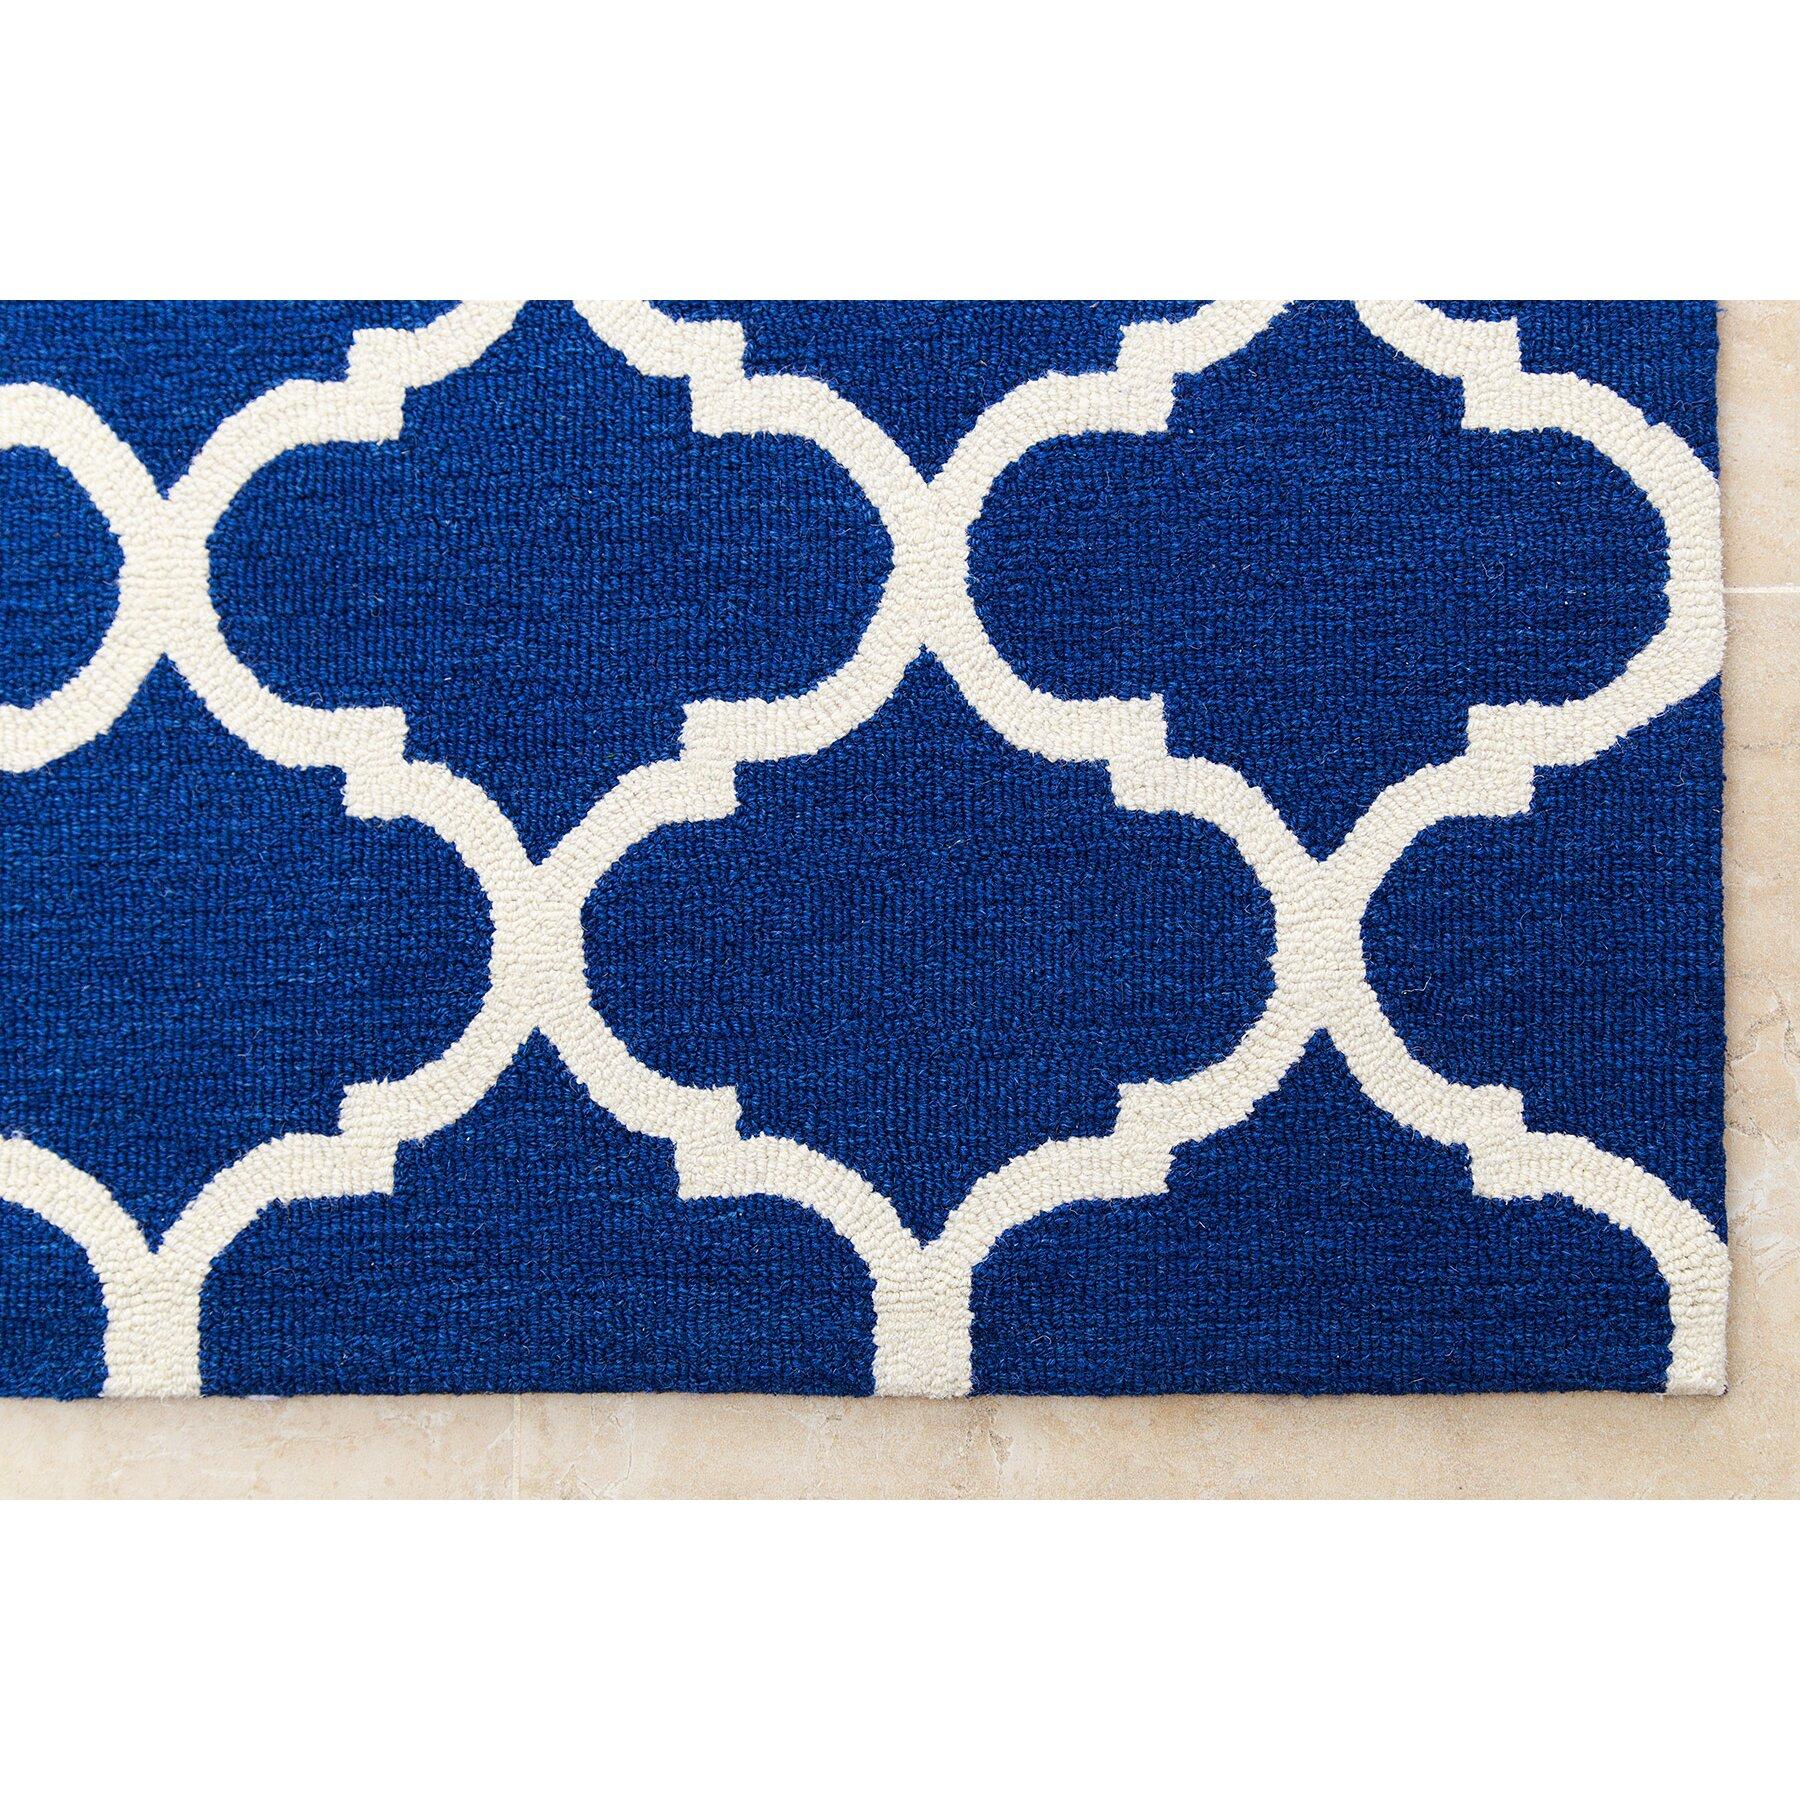 28 area rugs navy blue carson hand tufted navy blue area ru